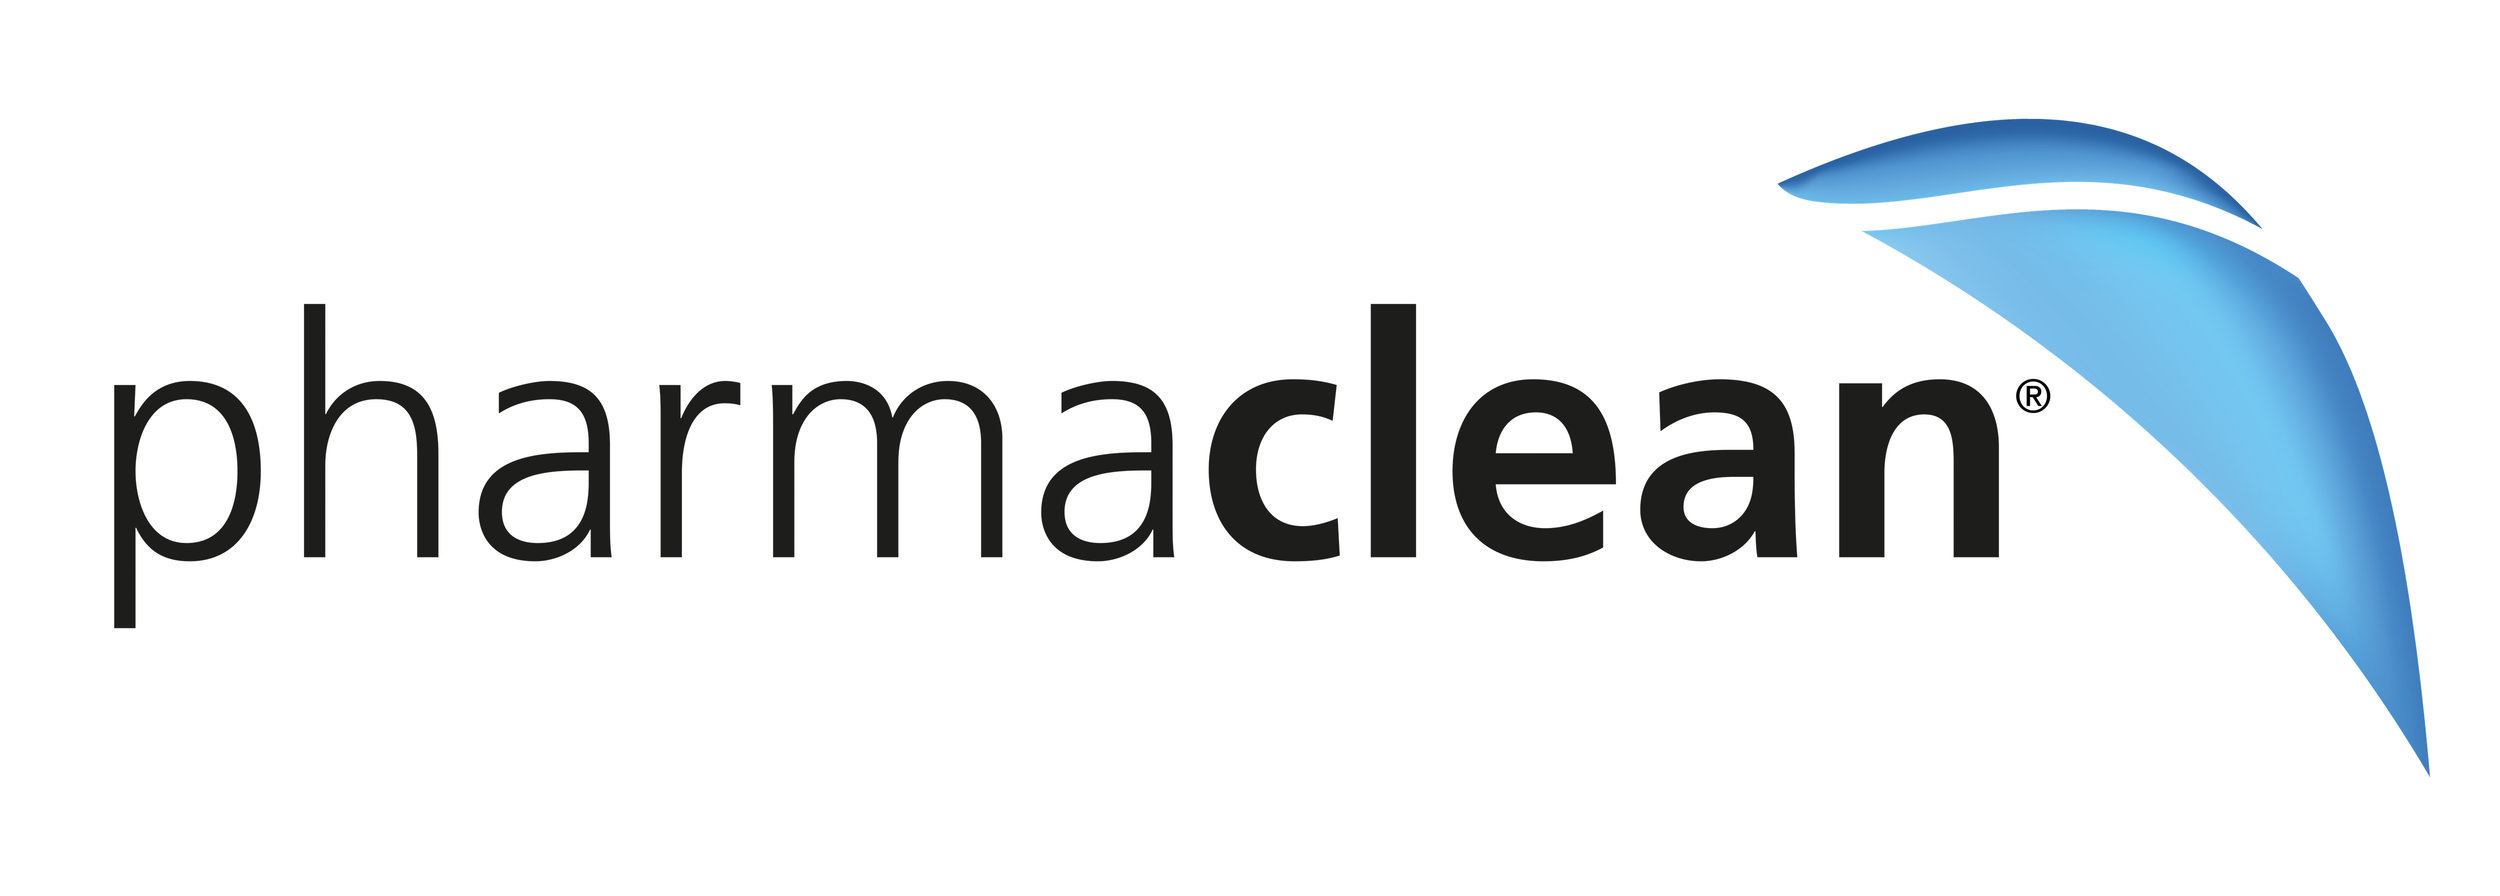 Logo-Pharmaclean_3D-per_schermo.jpg